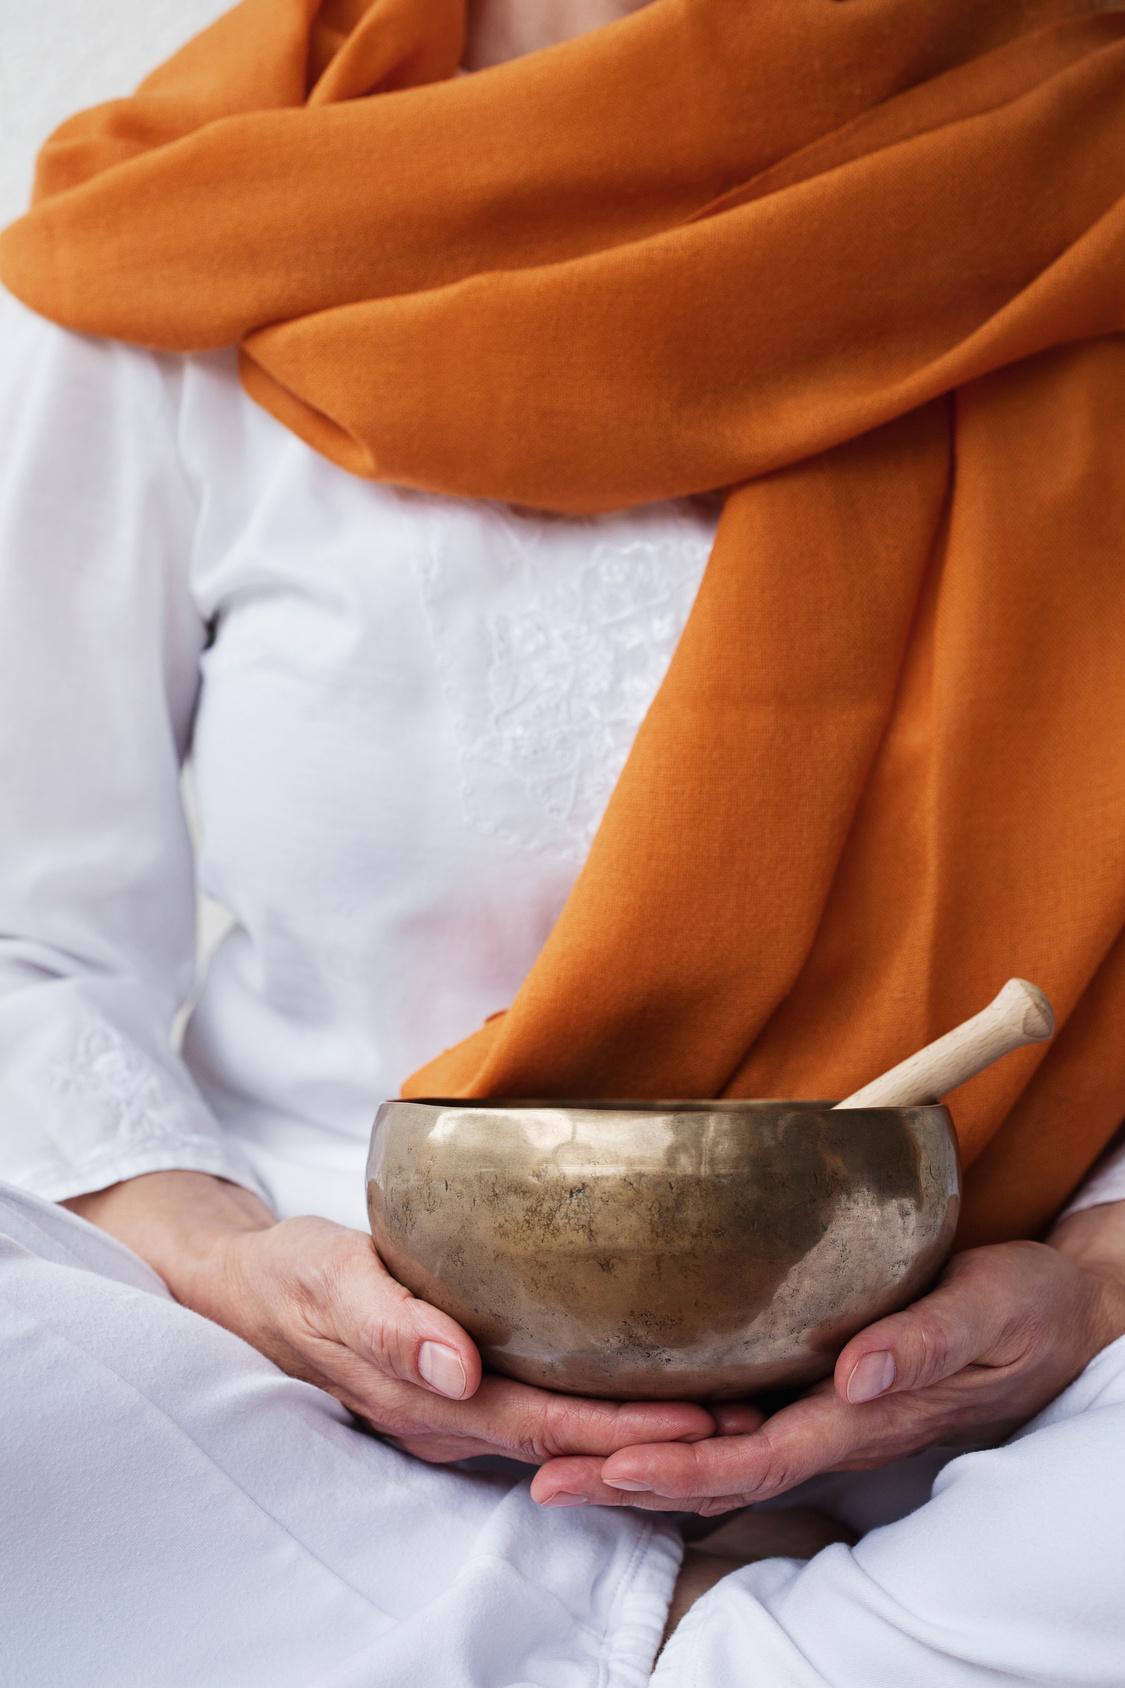 mains et bol tibétain